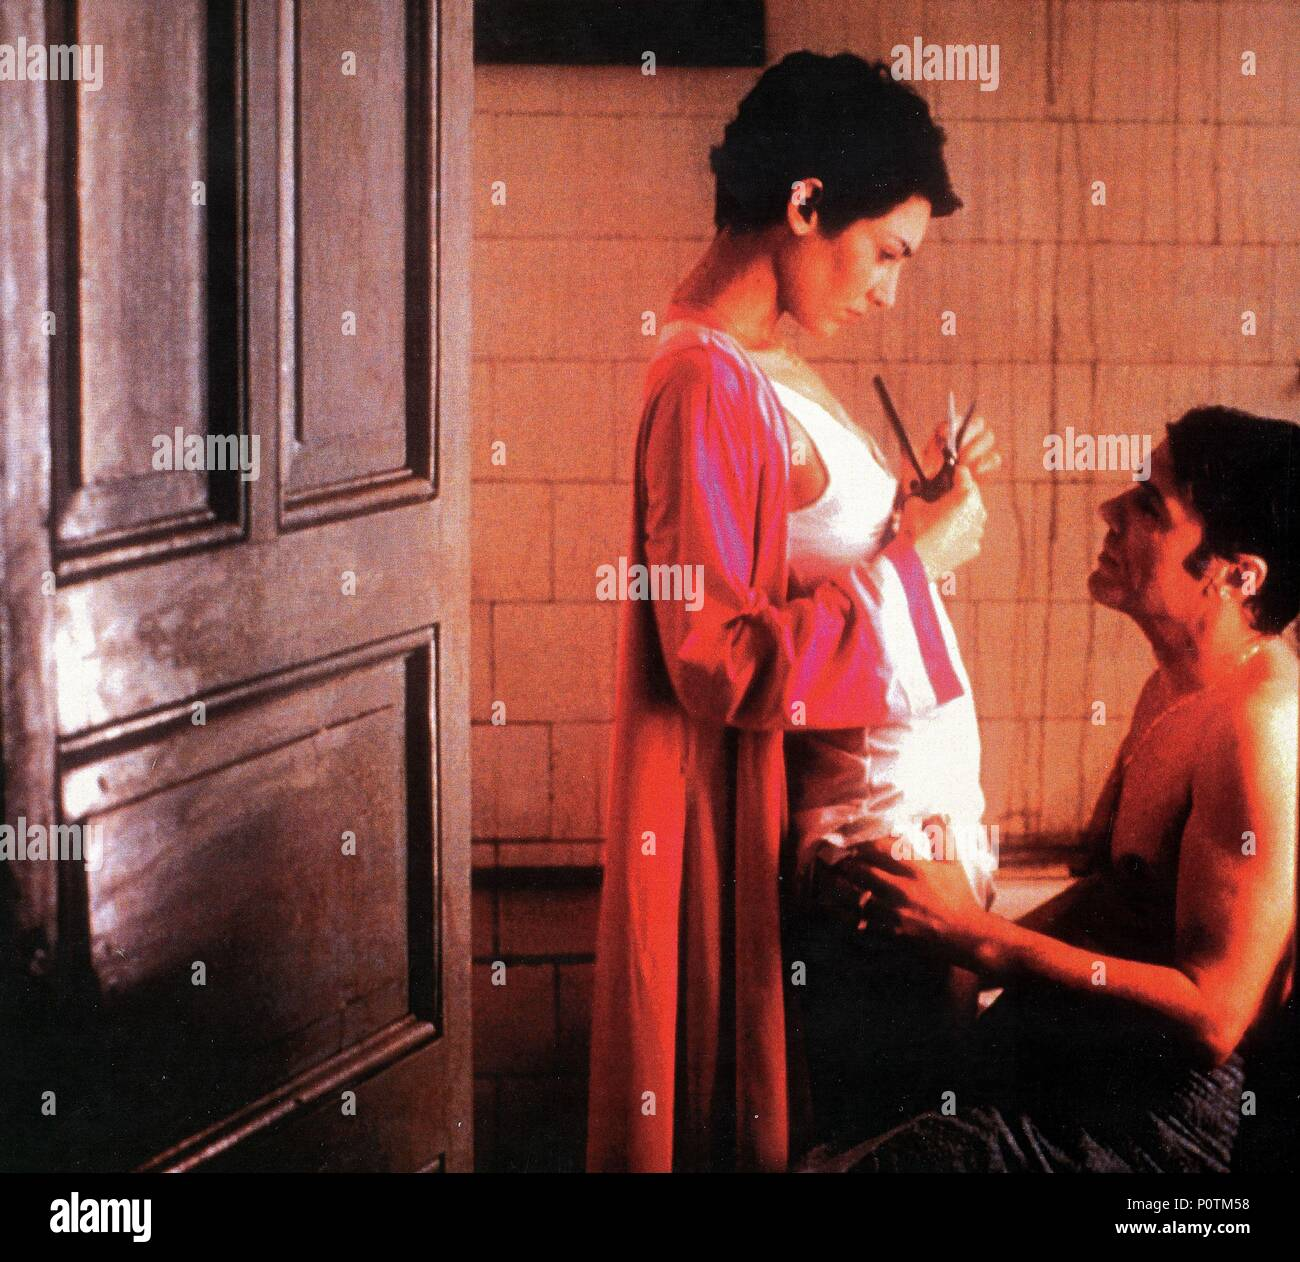 Original Film Title: EN LA PUTA VIDA.  English Title: IN THIS TRICKY LIFE.  Film Director: BEATRIZ FLORES SILVA.  Year: 2001. Credit: SAGA FILM/AVALON PRODUCTIONS/BFS PRODUCTIONS/ICAIC / Album - Stock Image